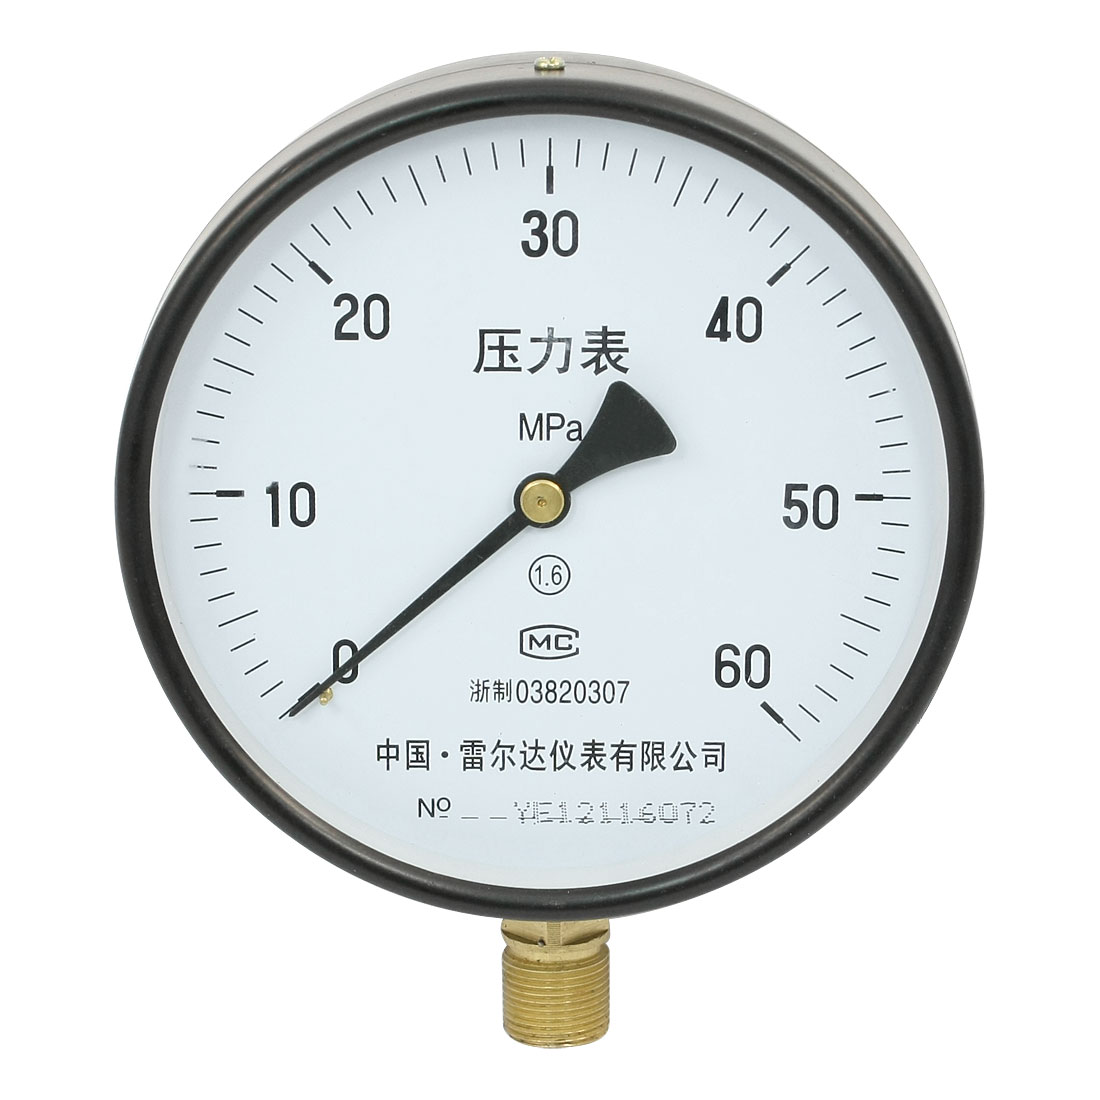 Y-150 M20 x 1.5 Thread 60Mpa Air Pressure Gauge for Industrial Compressor